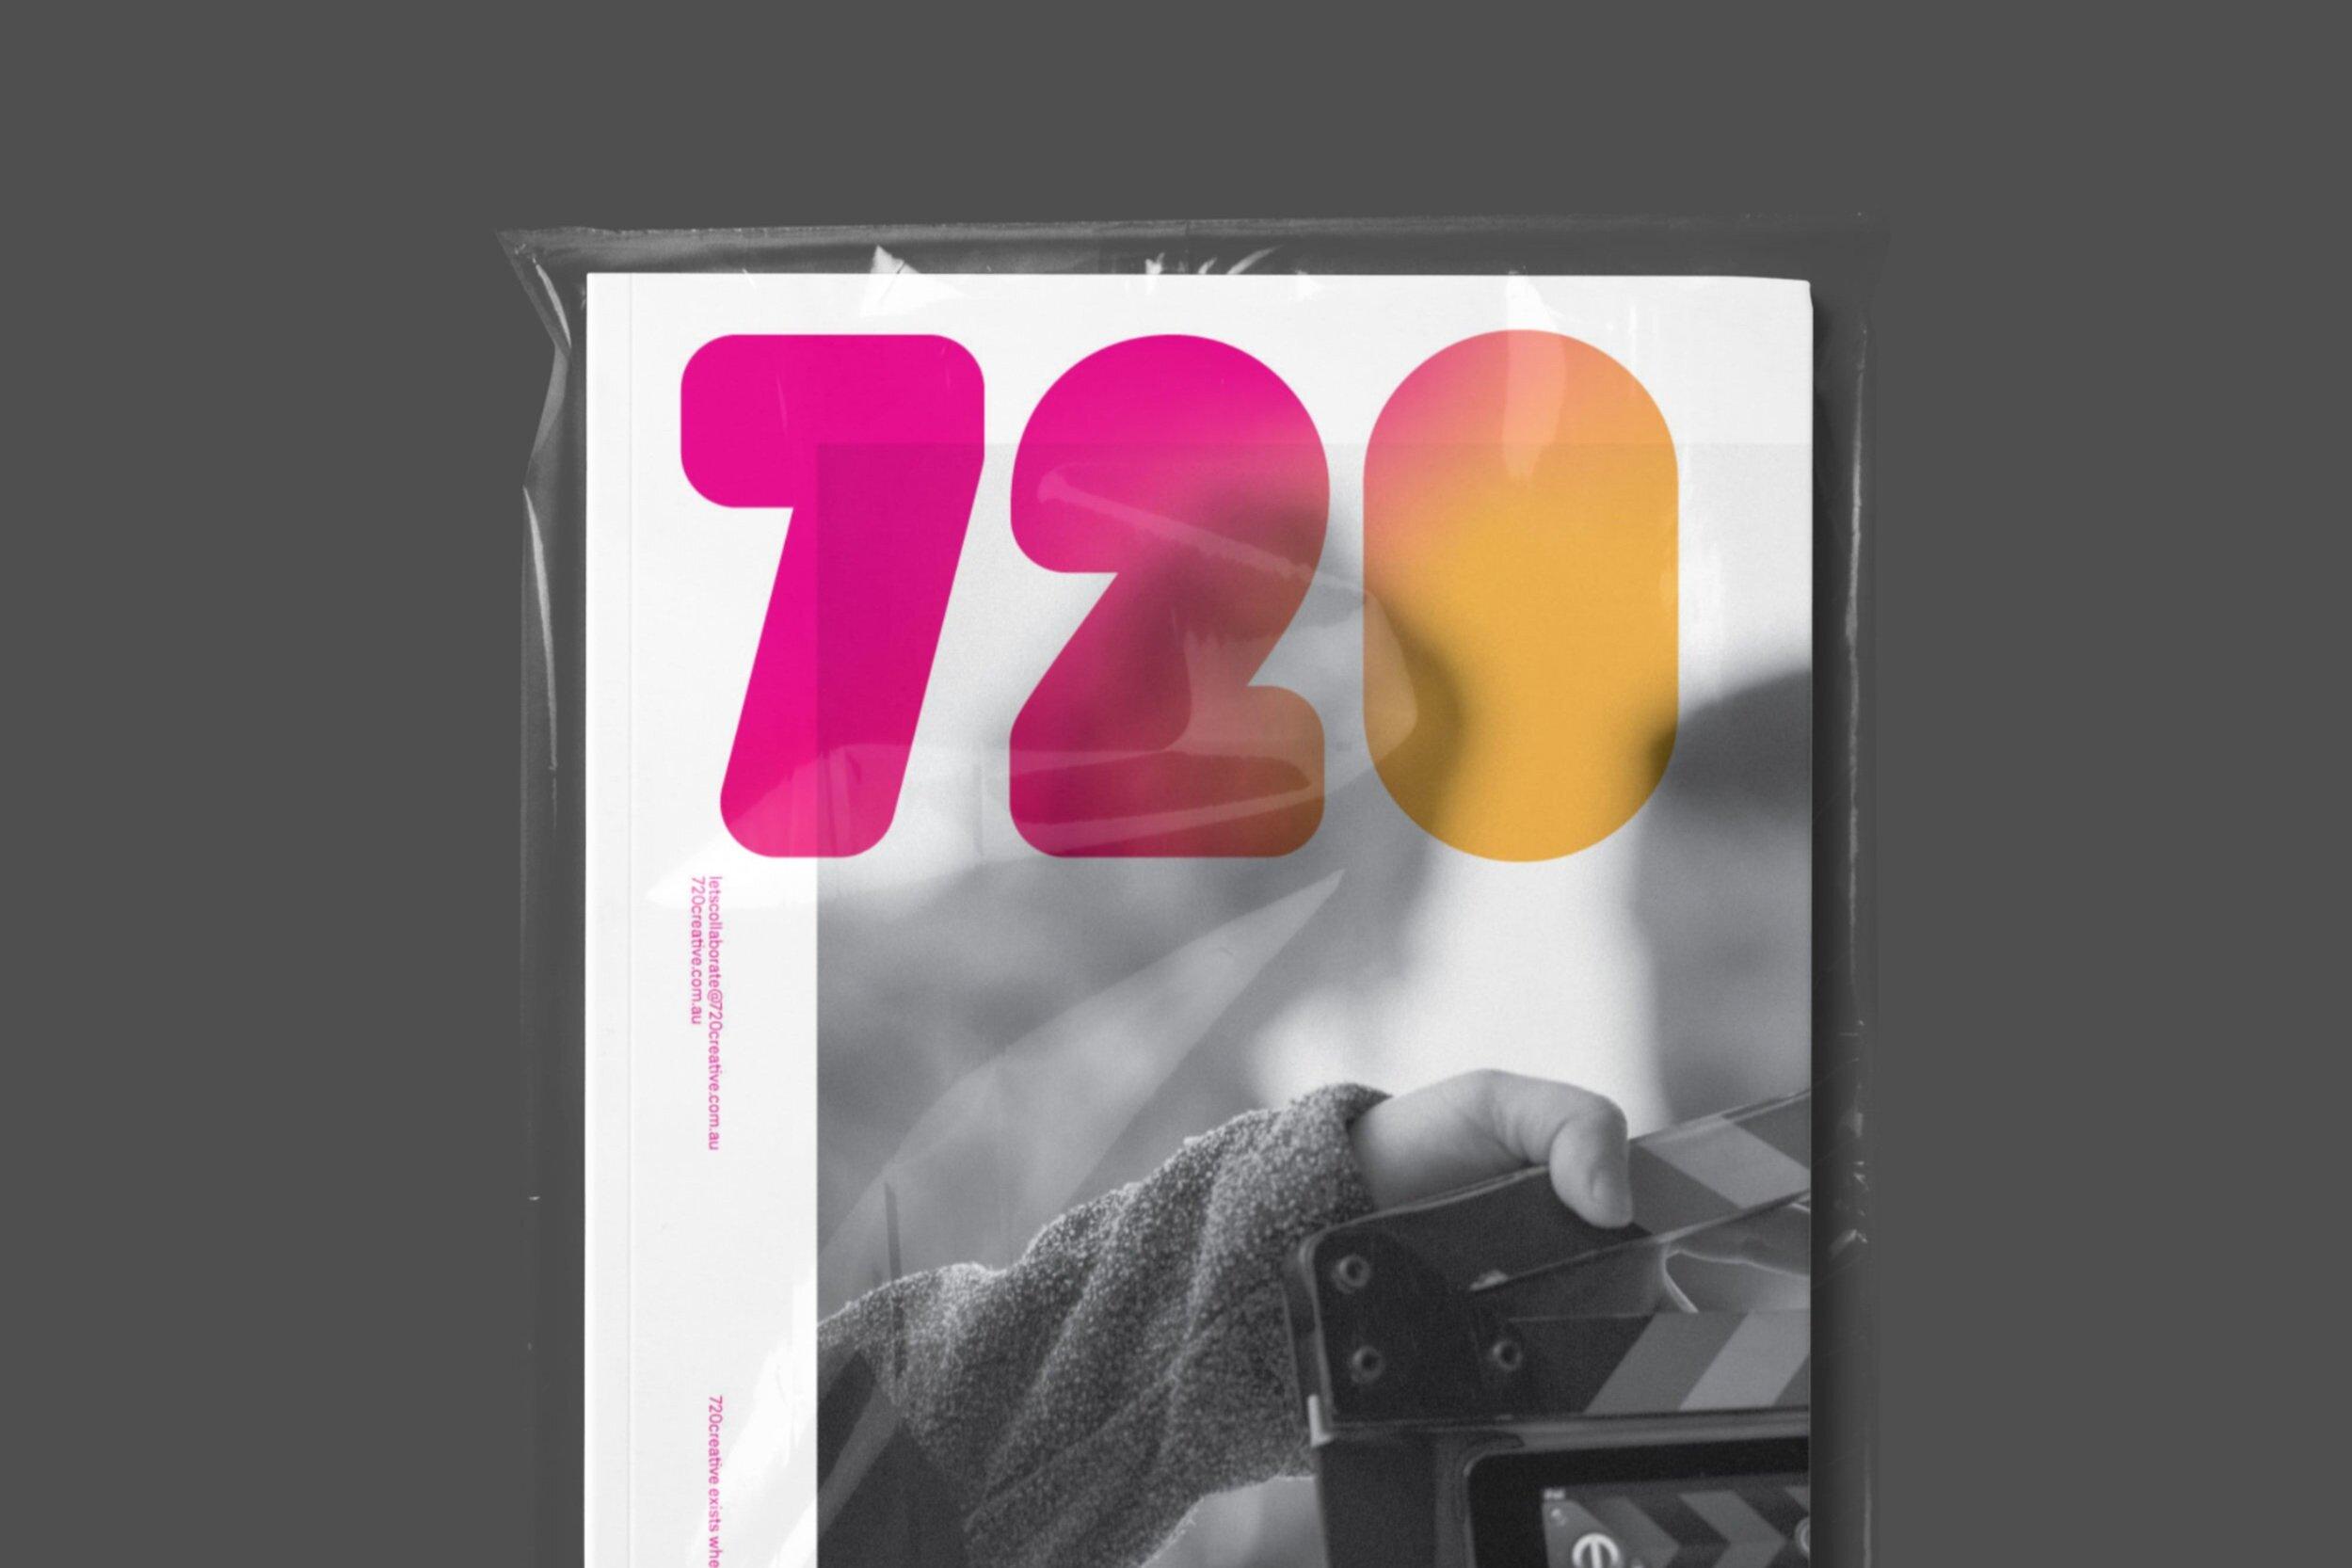 720 Creative - Branding, Collateral, Digital